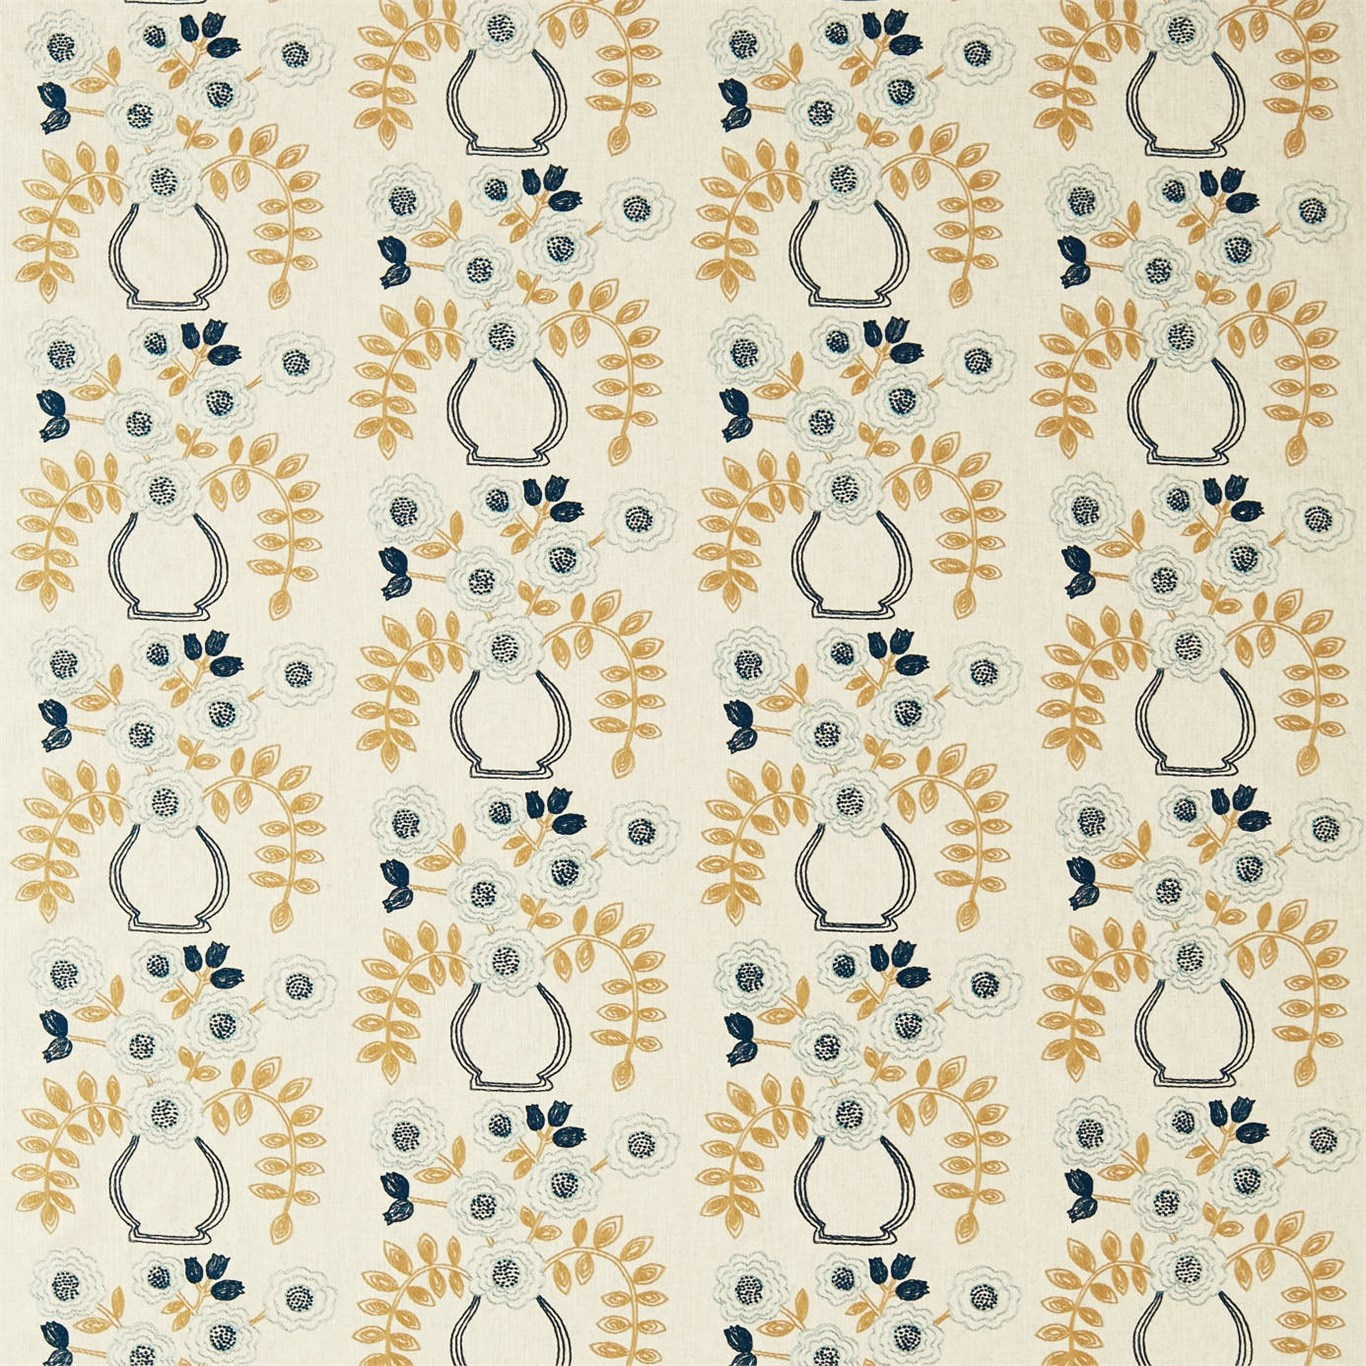 Image of Sanderson Home Flower Pot Dijon Curtain Fabric 235875